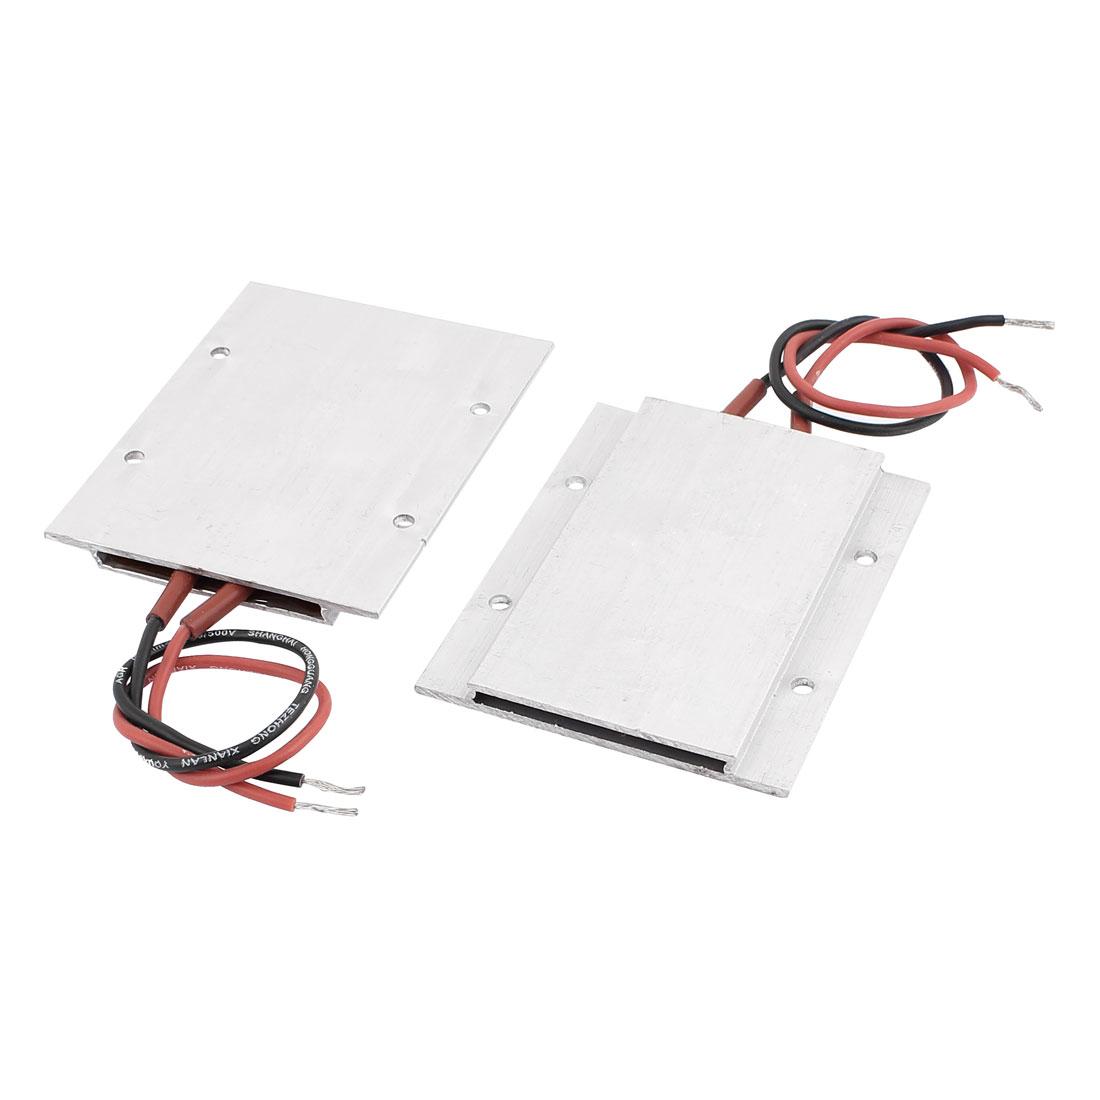 2Pcs 24V 60W 180C Insulation Aluminum Shell PTC Heating Element Thermostat Heater Plate